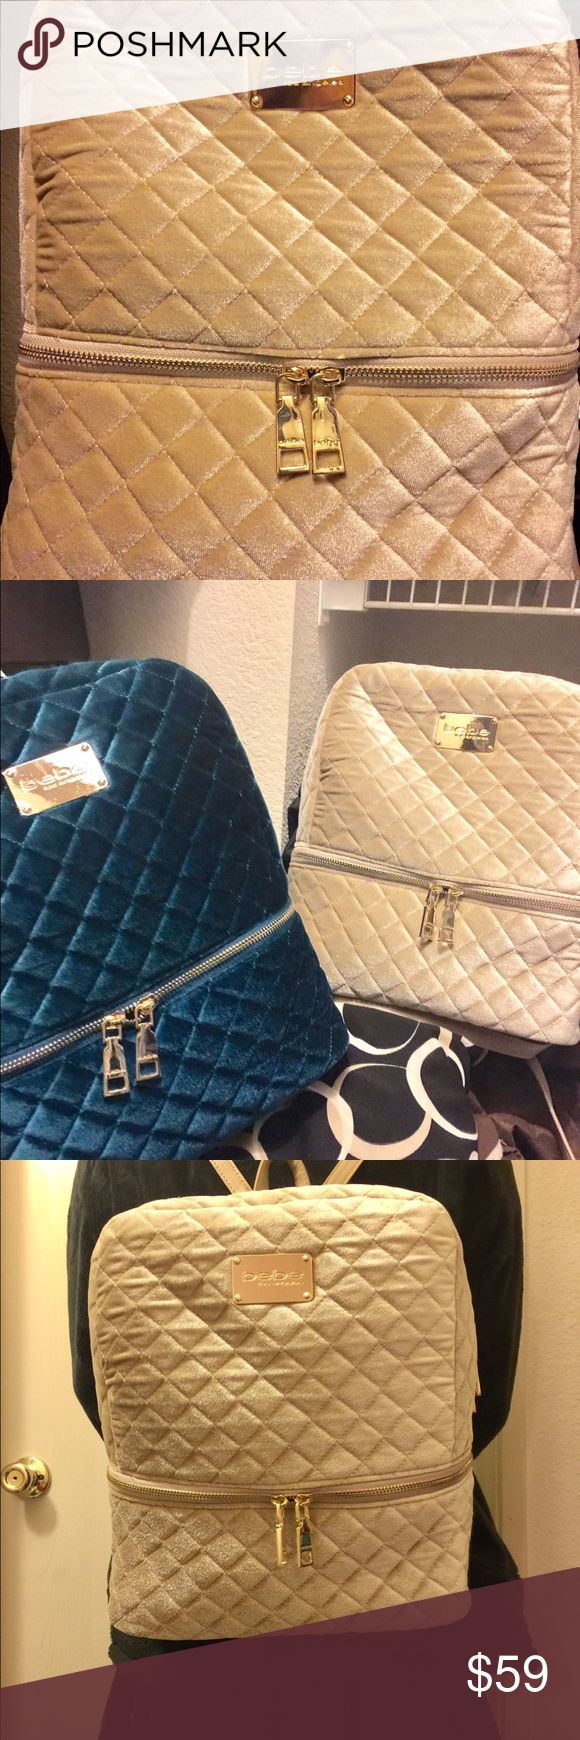 BeBe Gold Backpack Gorgeous Bebe gold backpack, trendy new style. BeBe Bags Backpacks